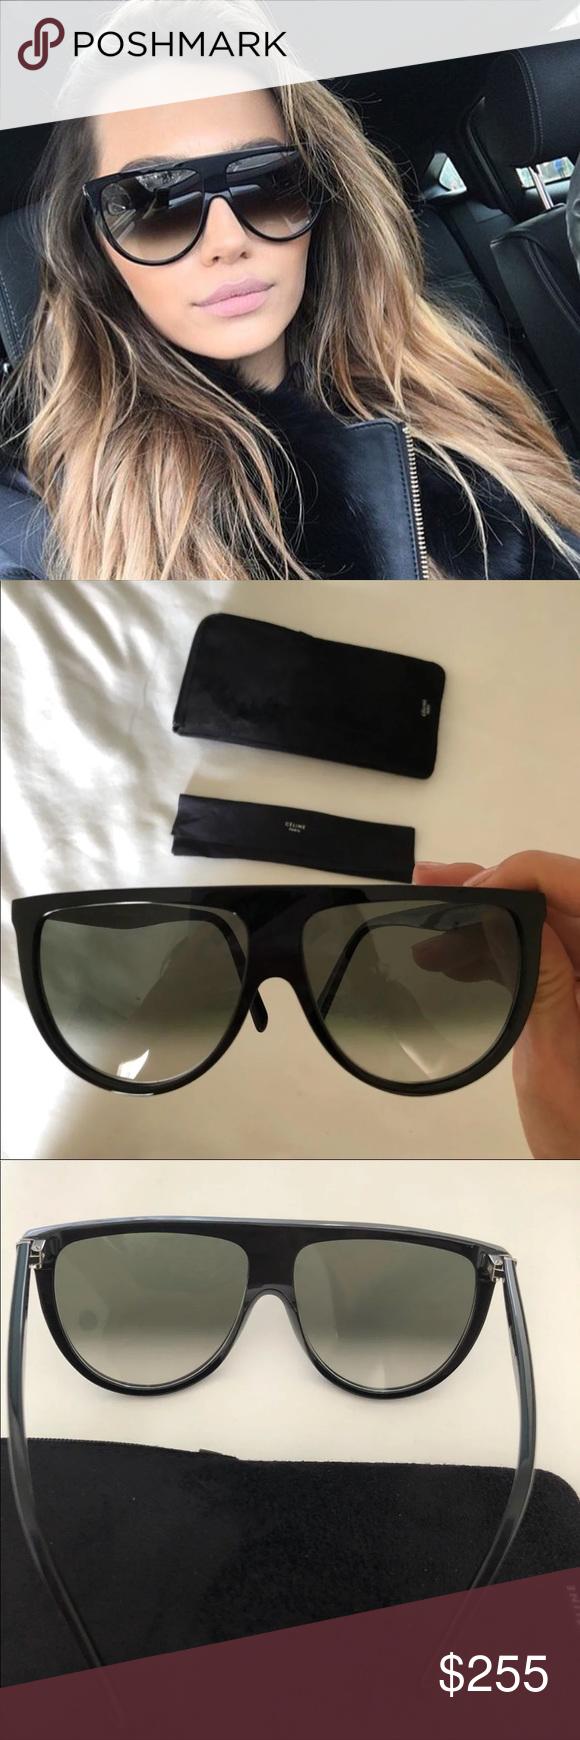 b26c9c9947 Spotted while shopping on Poshmark  Celine Thin Shadow sunglasses!   poshmark  fashion